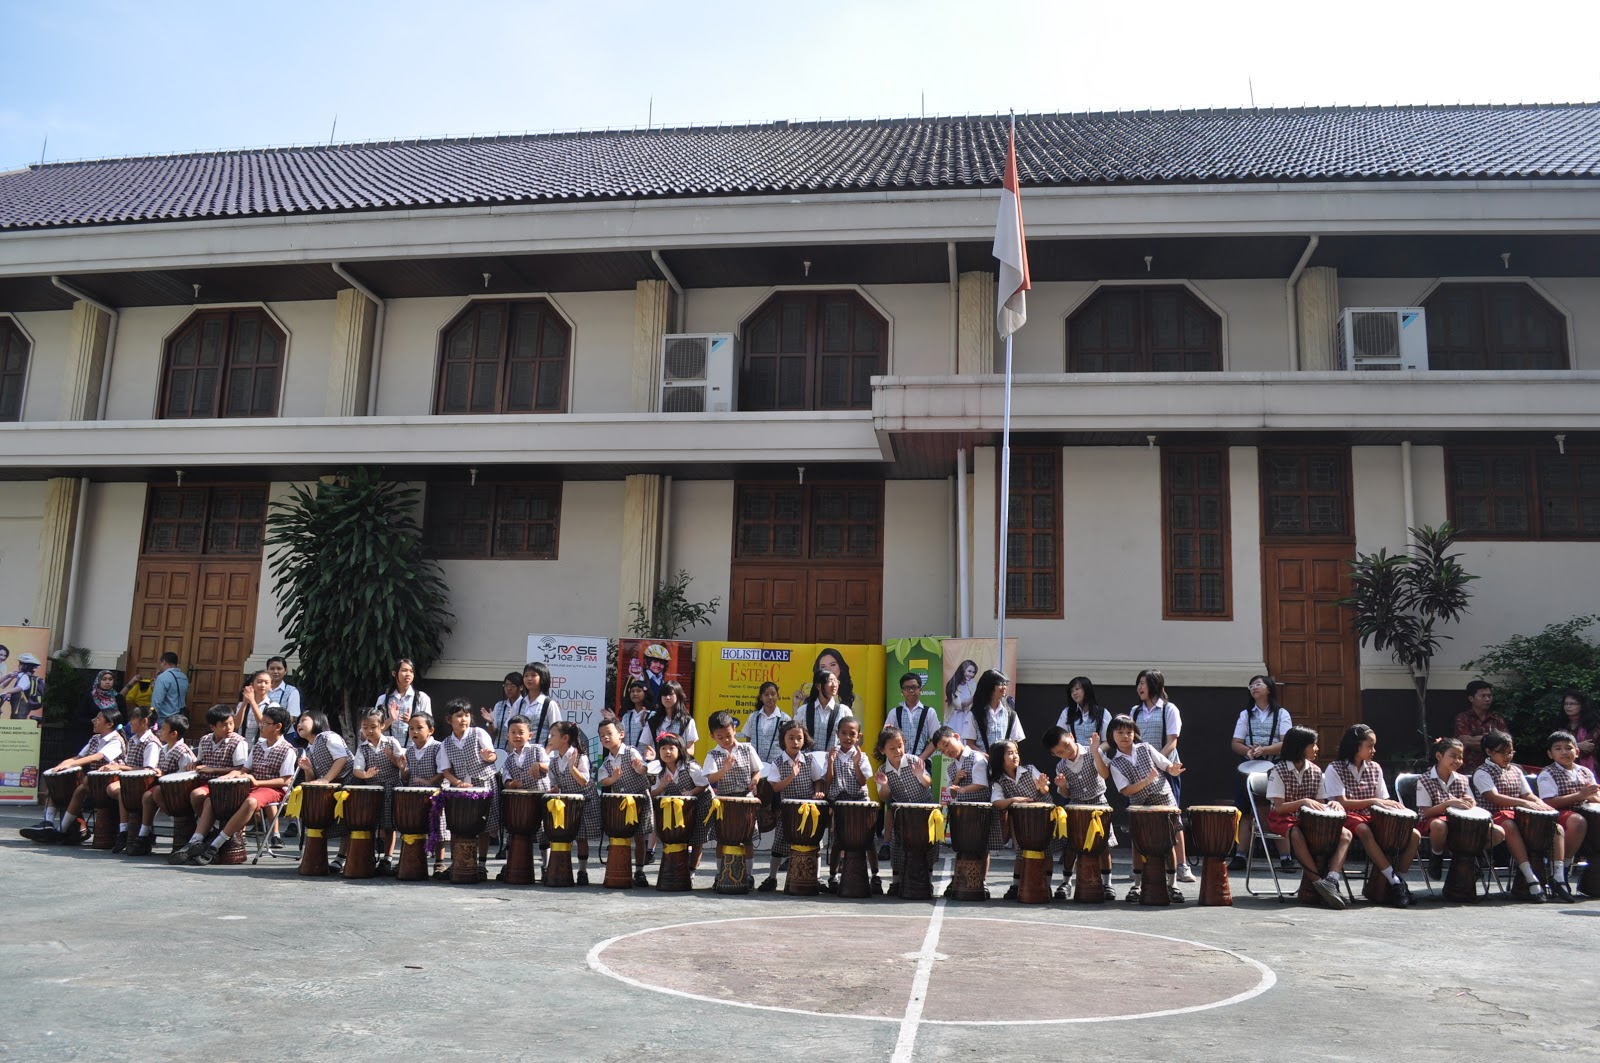 Sekolah Yos Sudarso Bandung. Foto: http://sekolahadiwiyatakotabandung.blogspot.co.id